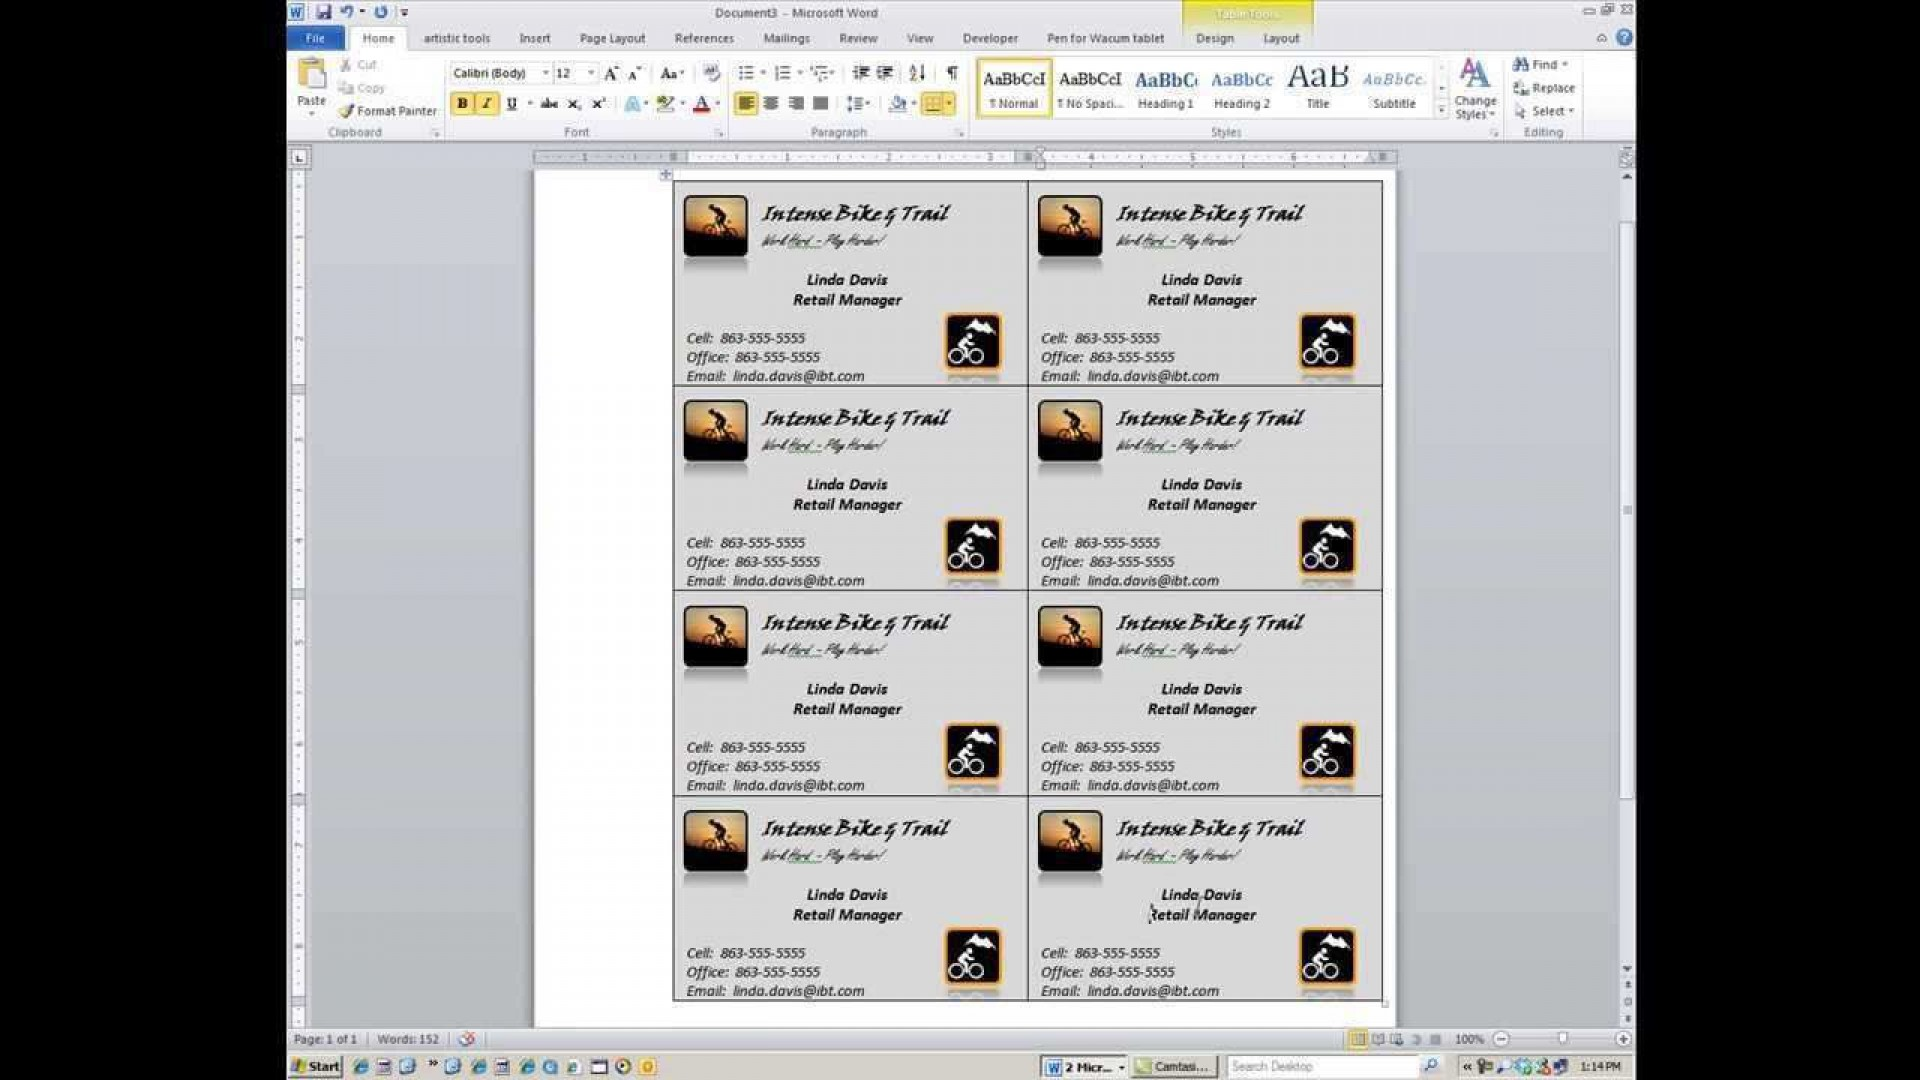 000 Magnificent M Office Busines Card Template Idea  Templates Microsoft 2010 20071920